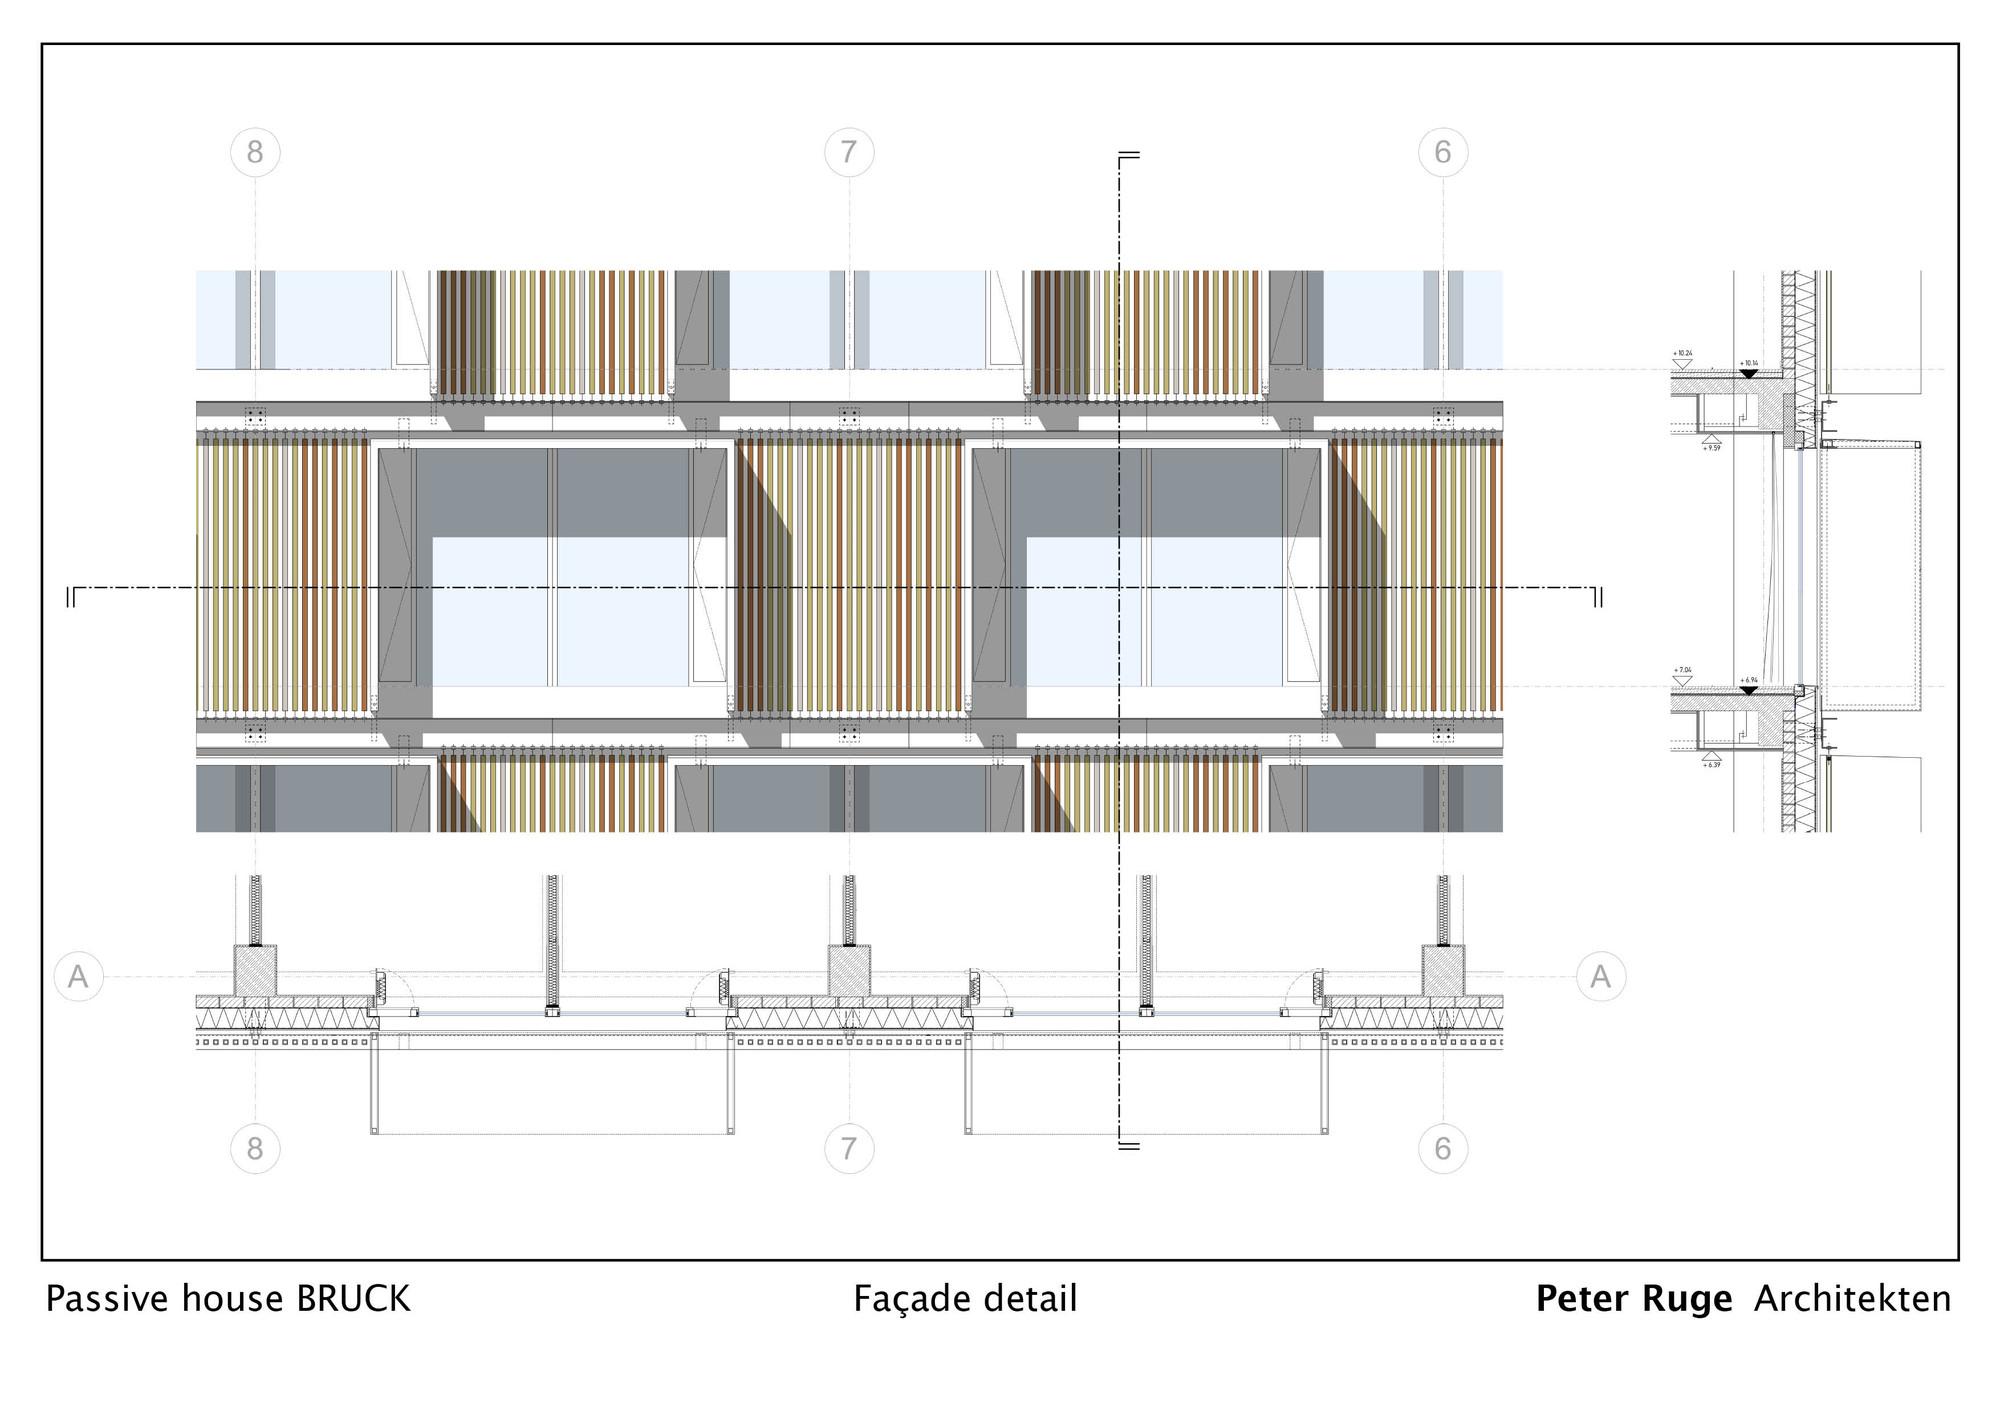 Gallery Of Passive House Bruck Peter Ruge Architekten 24